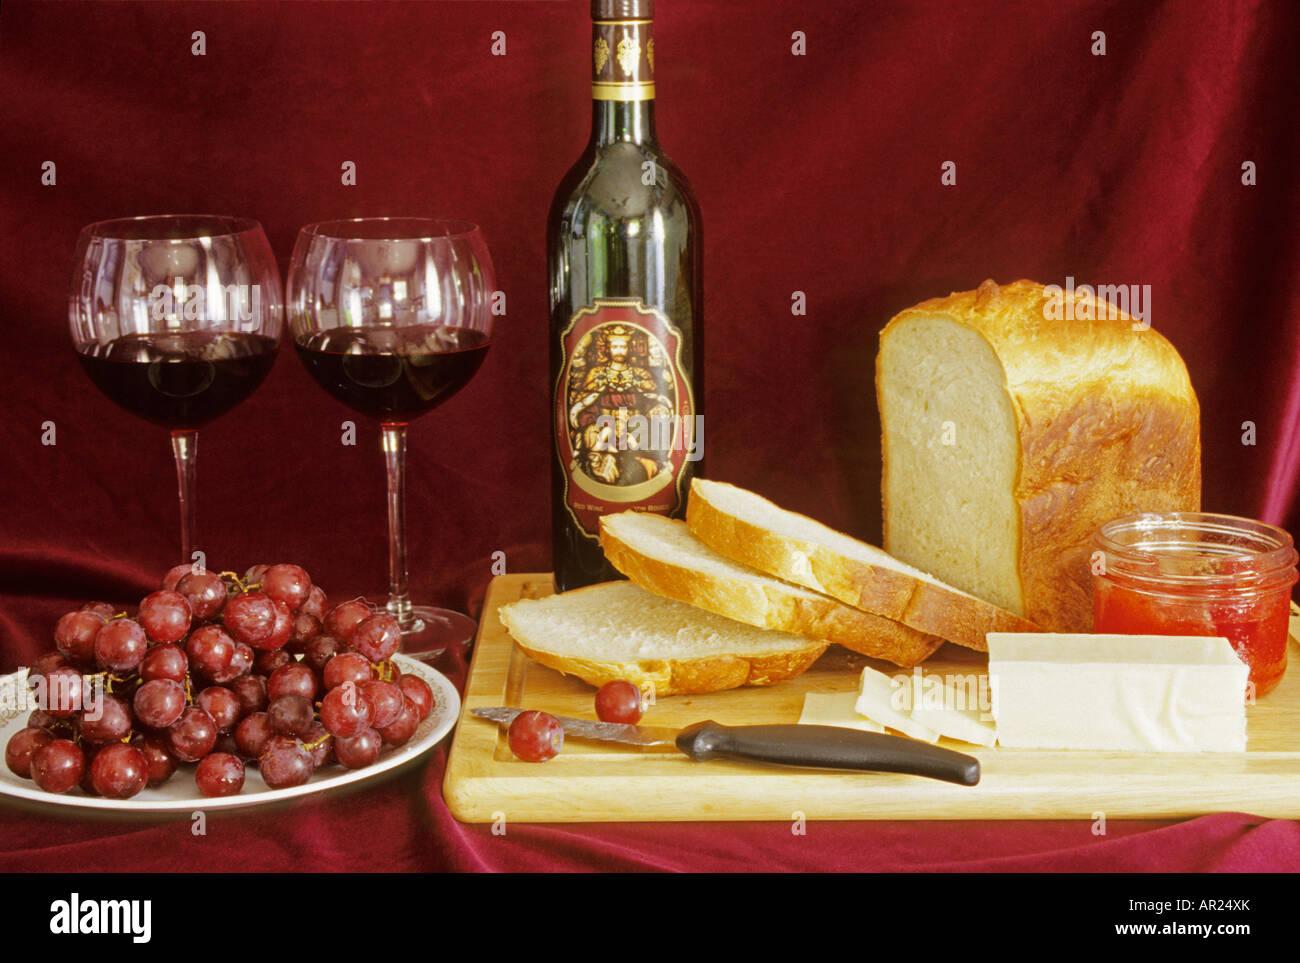 Still Life table de pain, vin, fromage, confiture, raisins Photo Stock